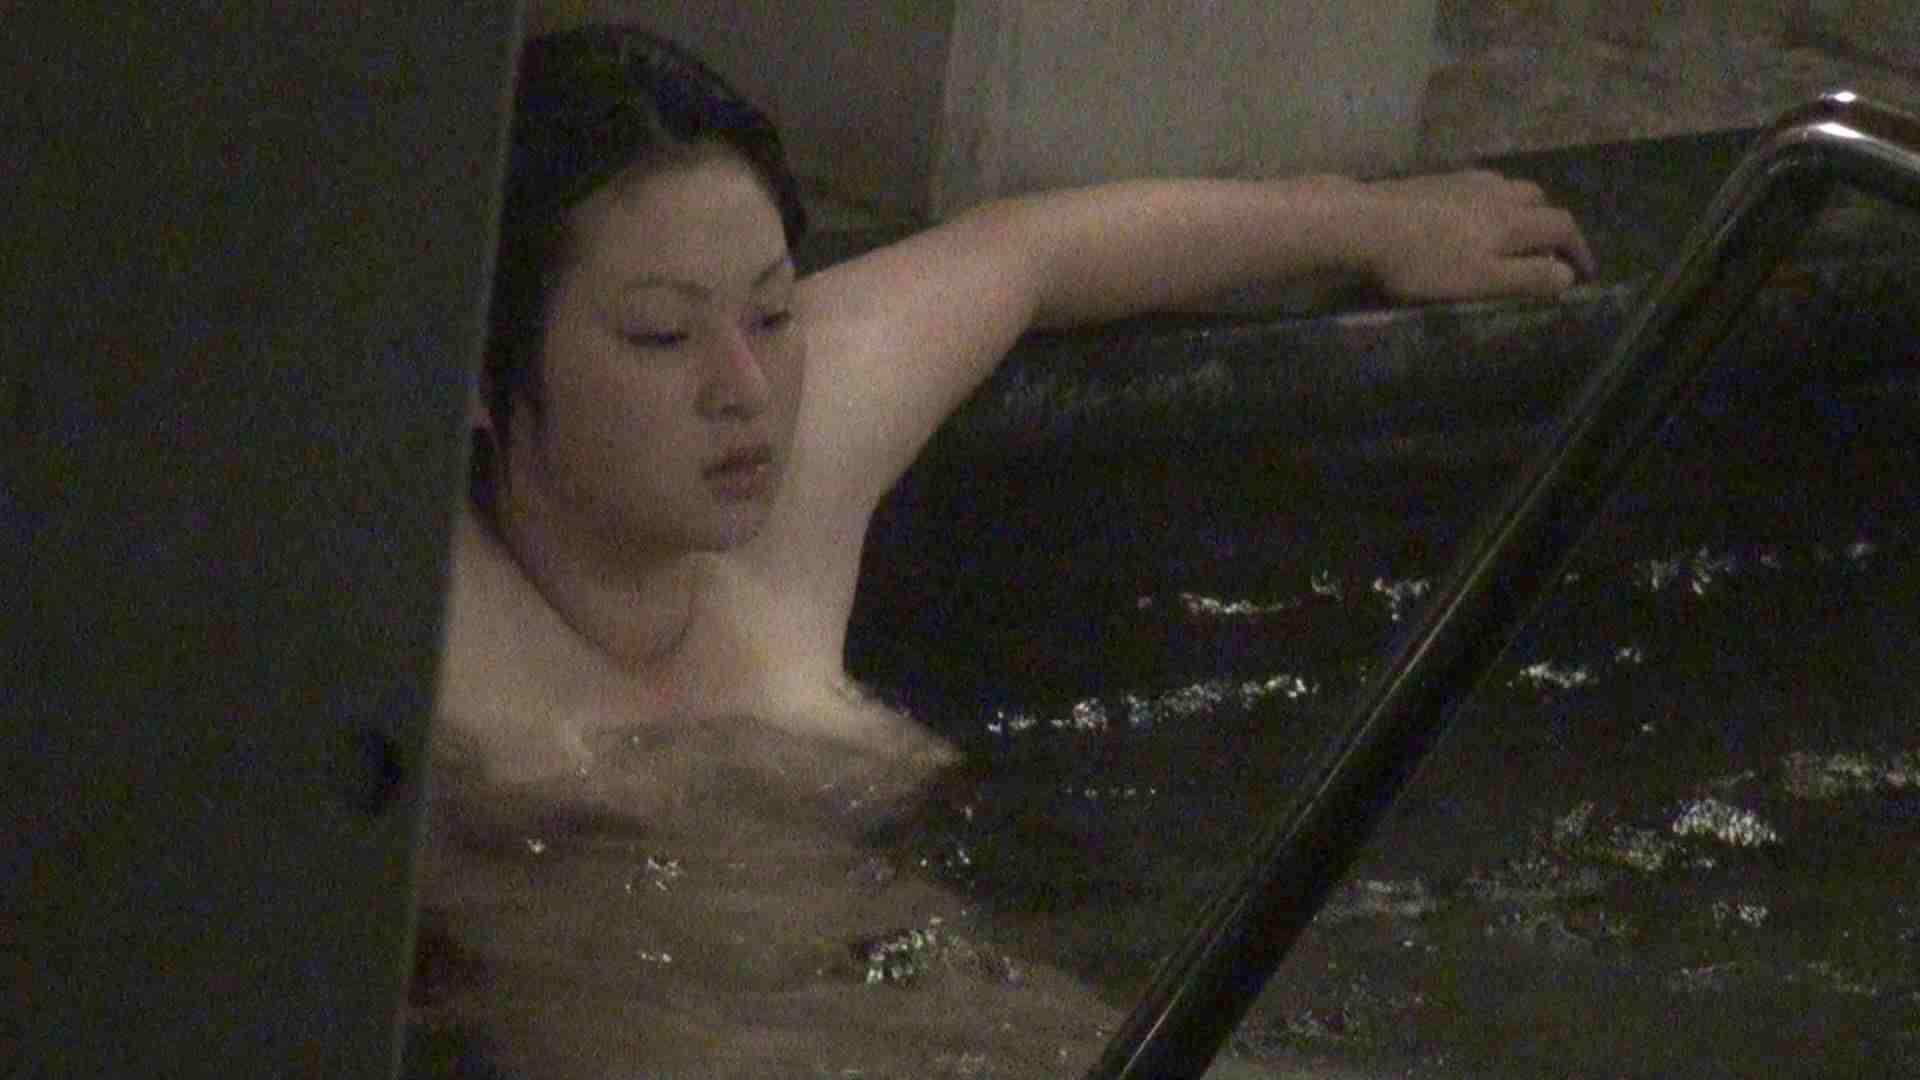 Aquaな露天風呂Vol.338 露天風呂編 | 盗撮シリーズ  82PIX 55